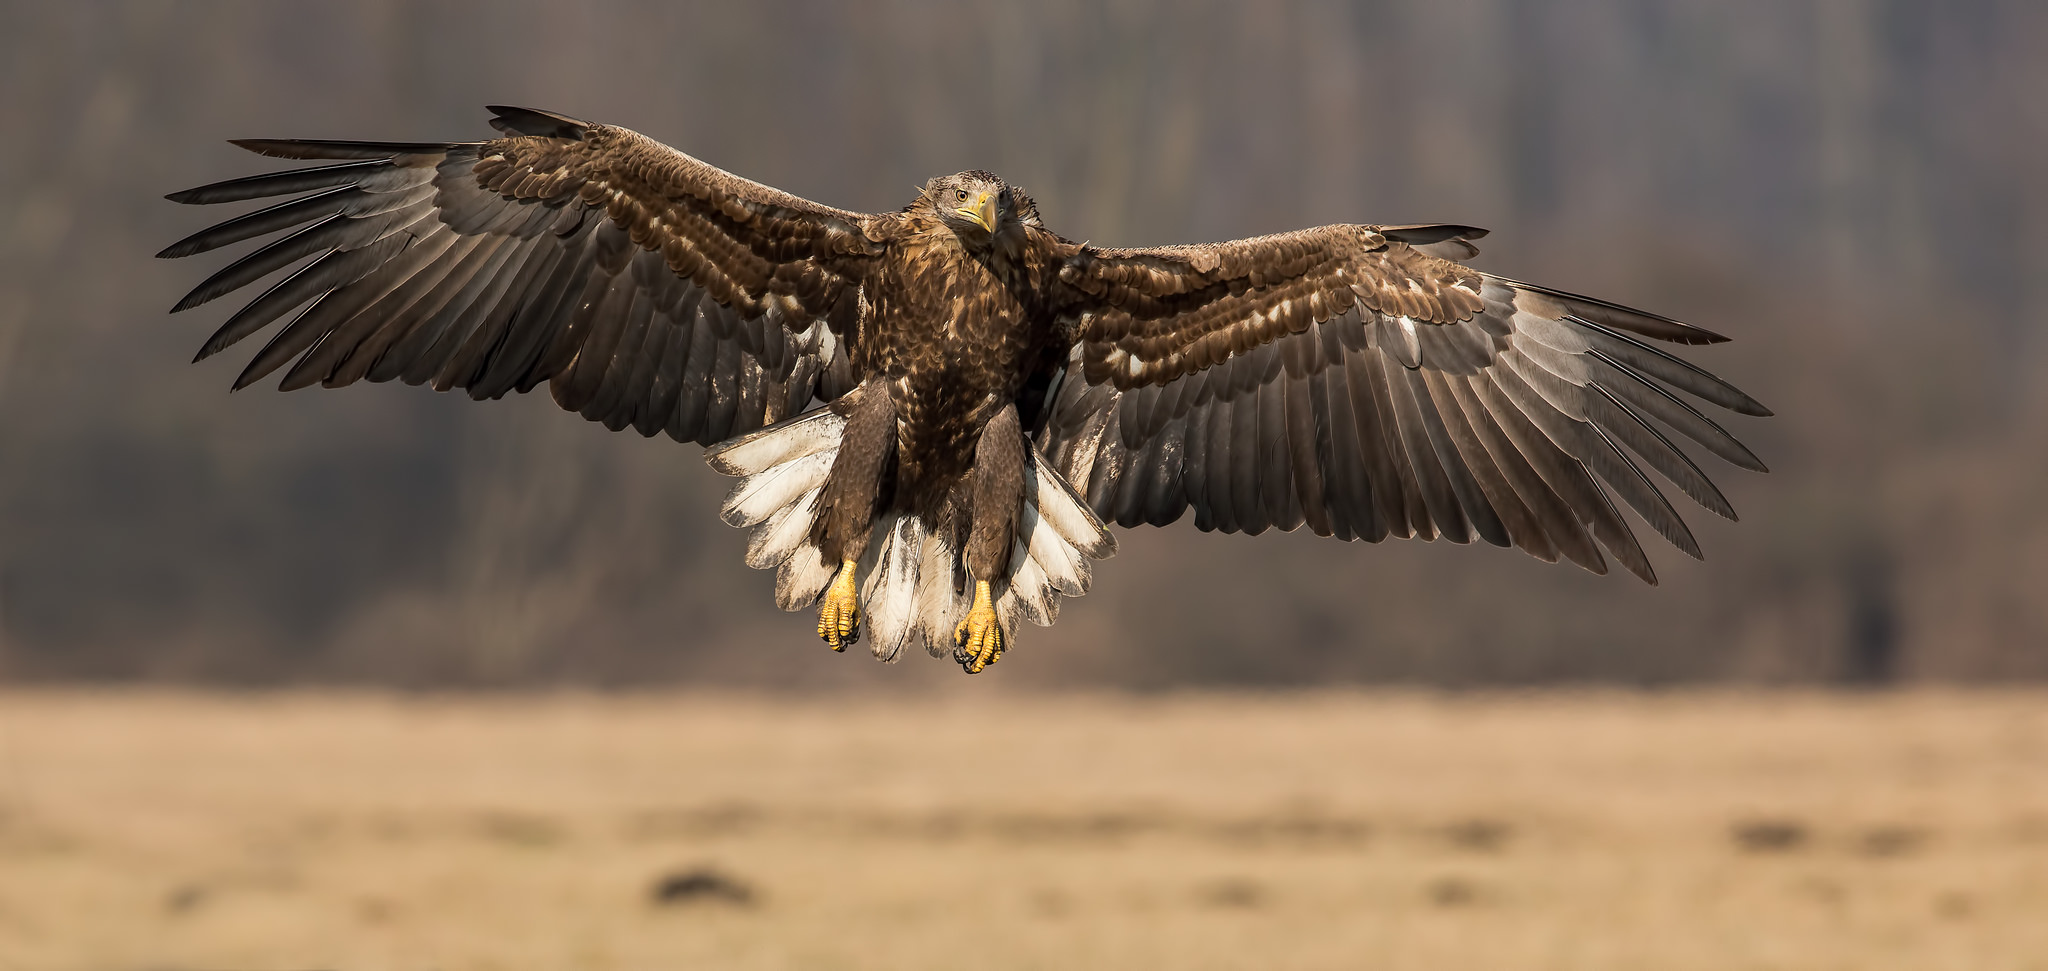 Un águila con las alas extendidas - 2048x971